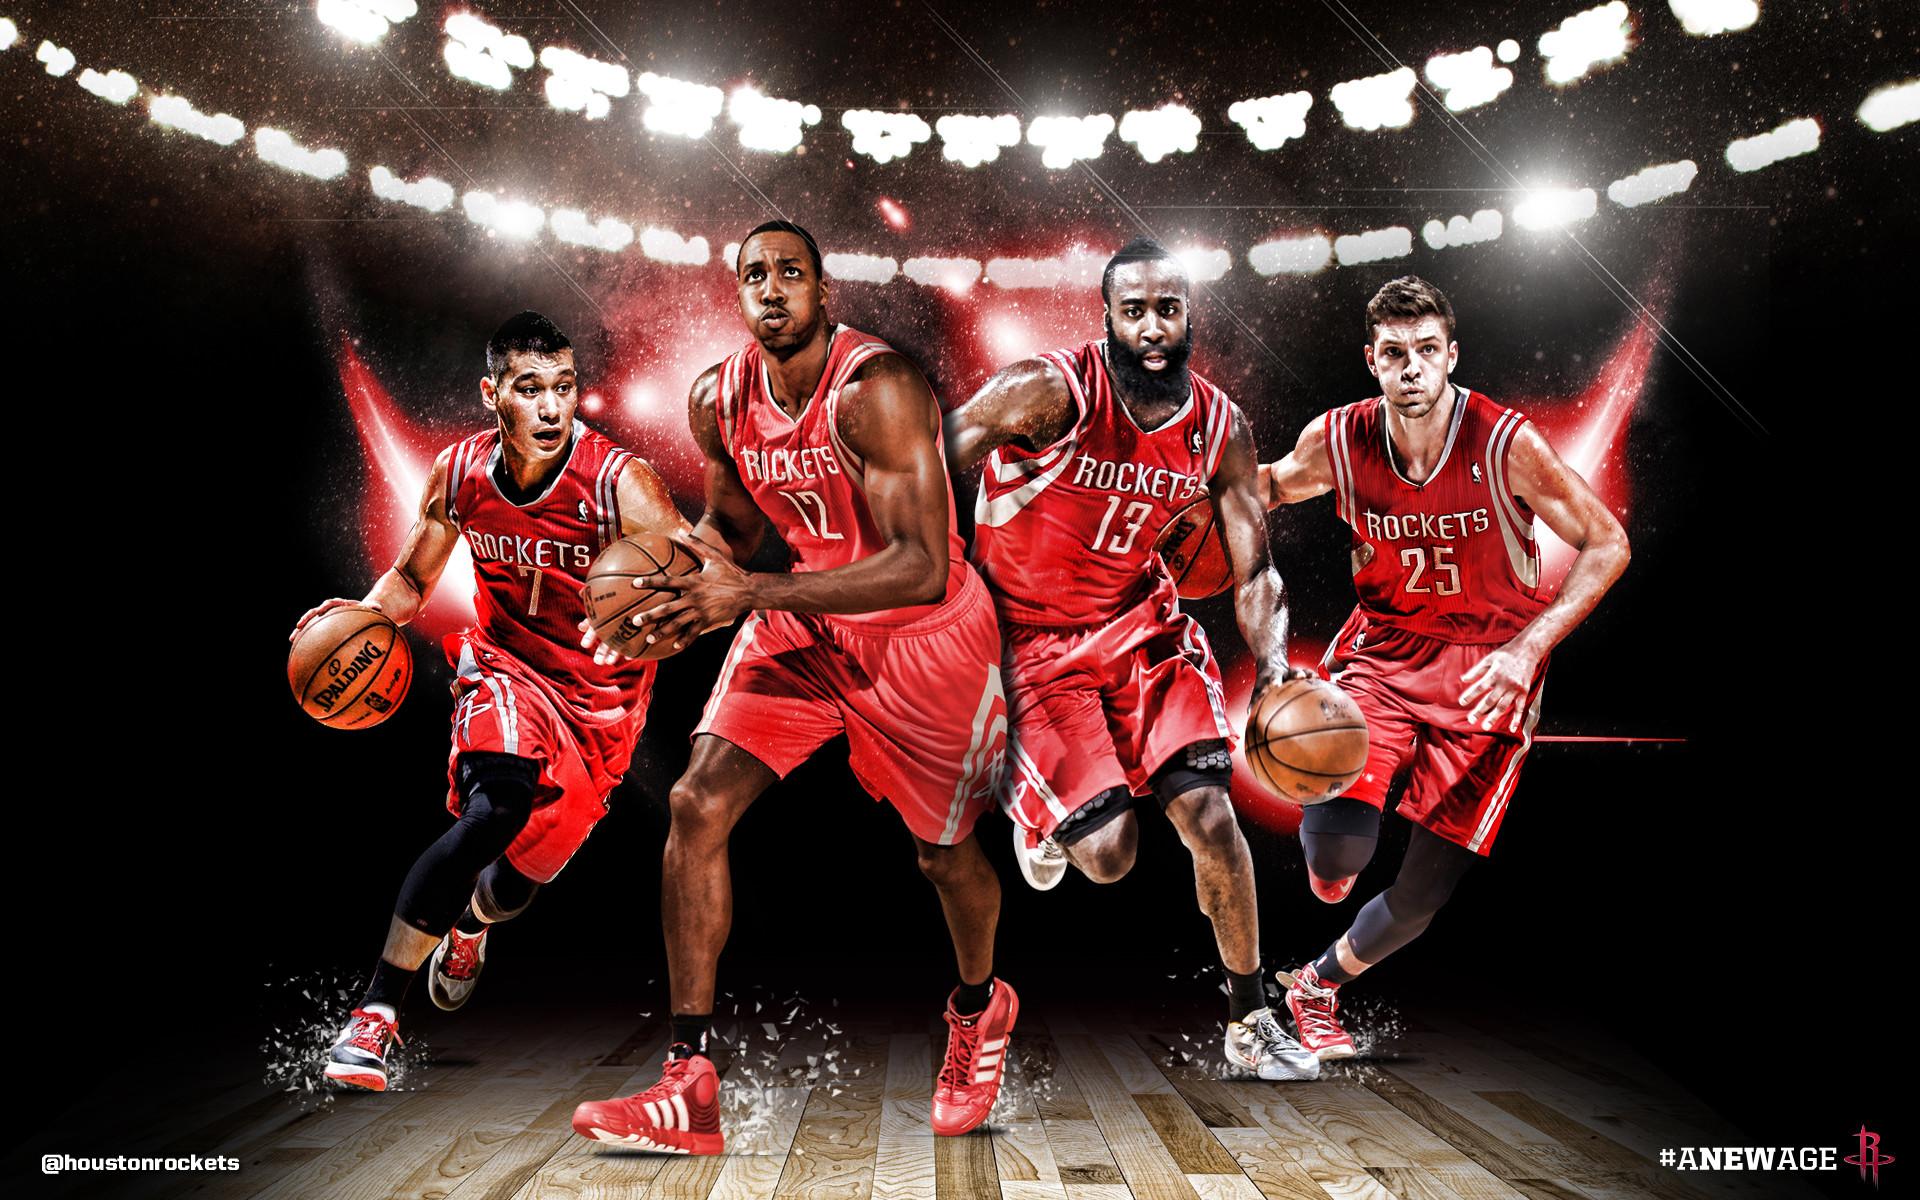 Nike Wallpaper Nba: NBA Basketball Wallpaper 2018 (63+ Images